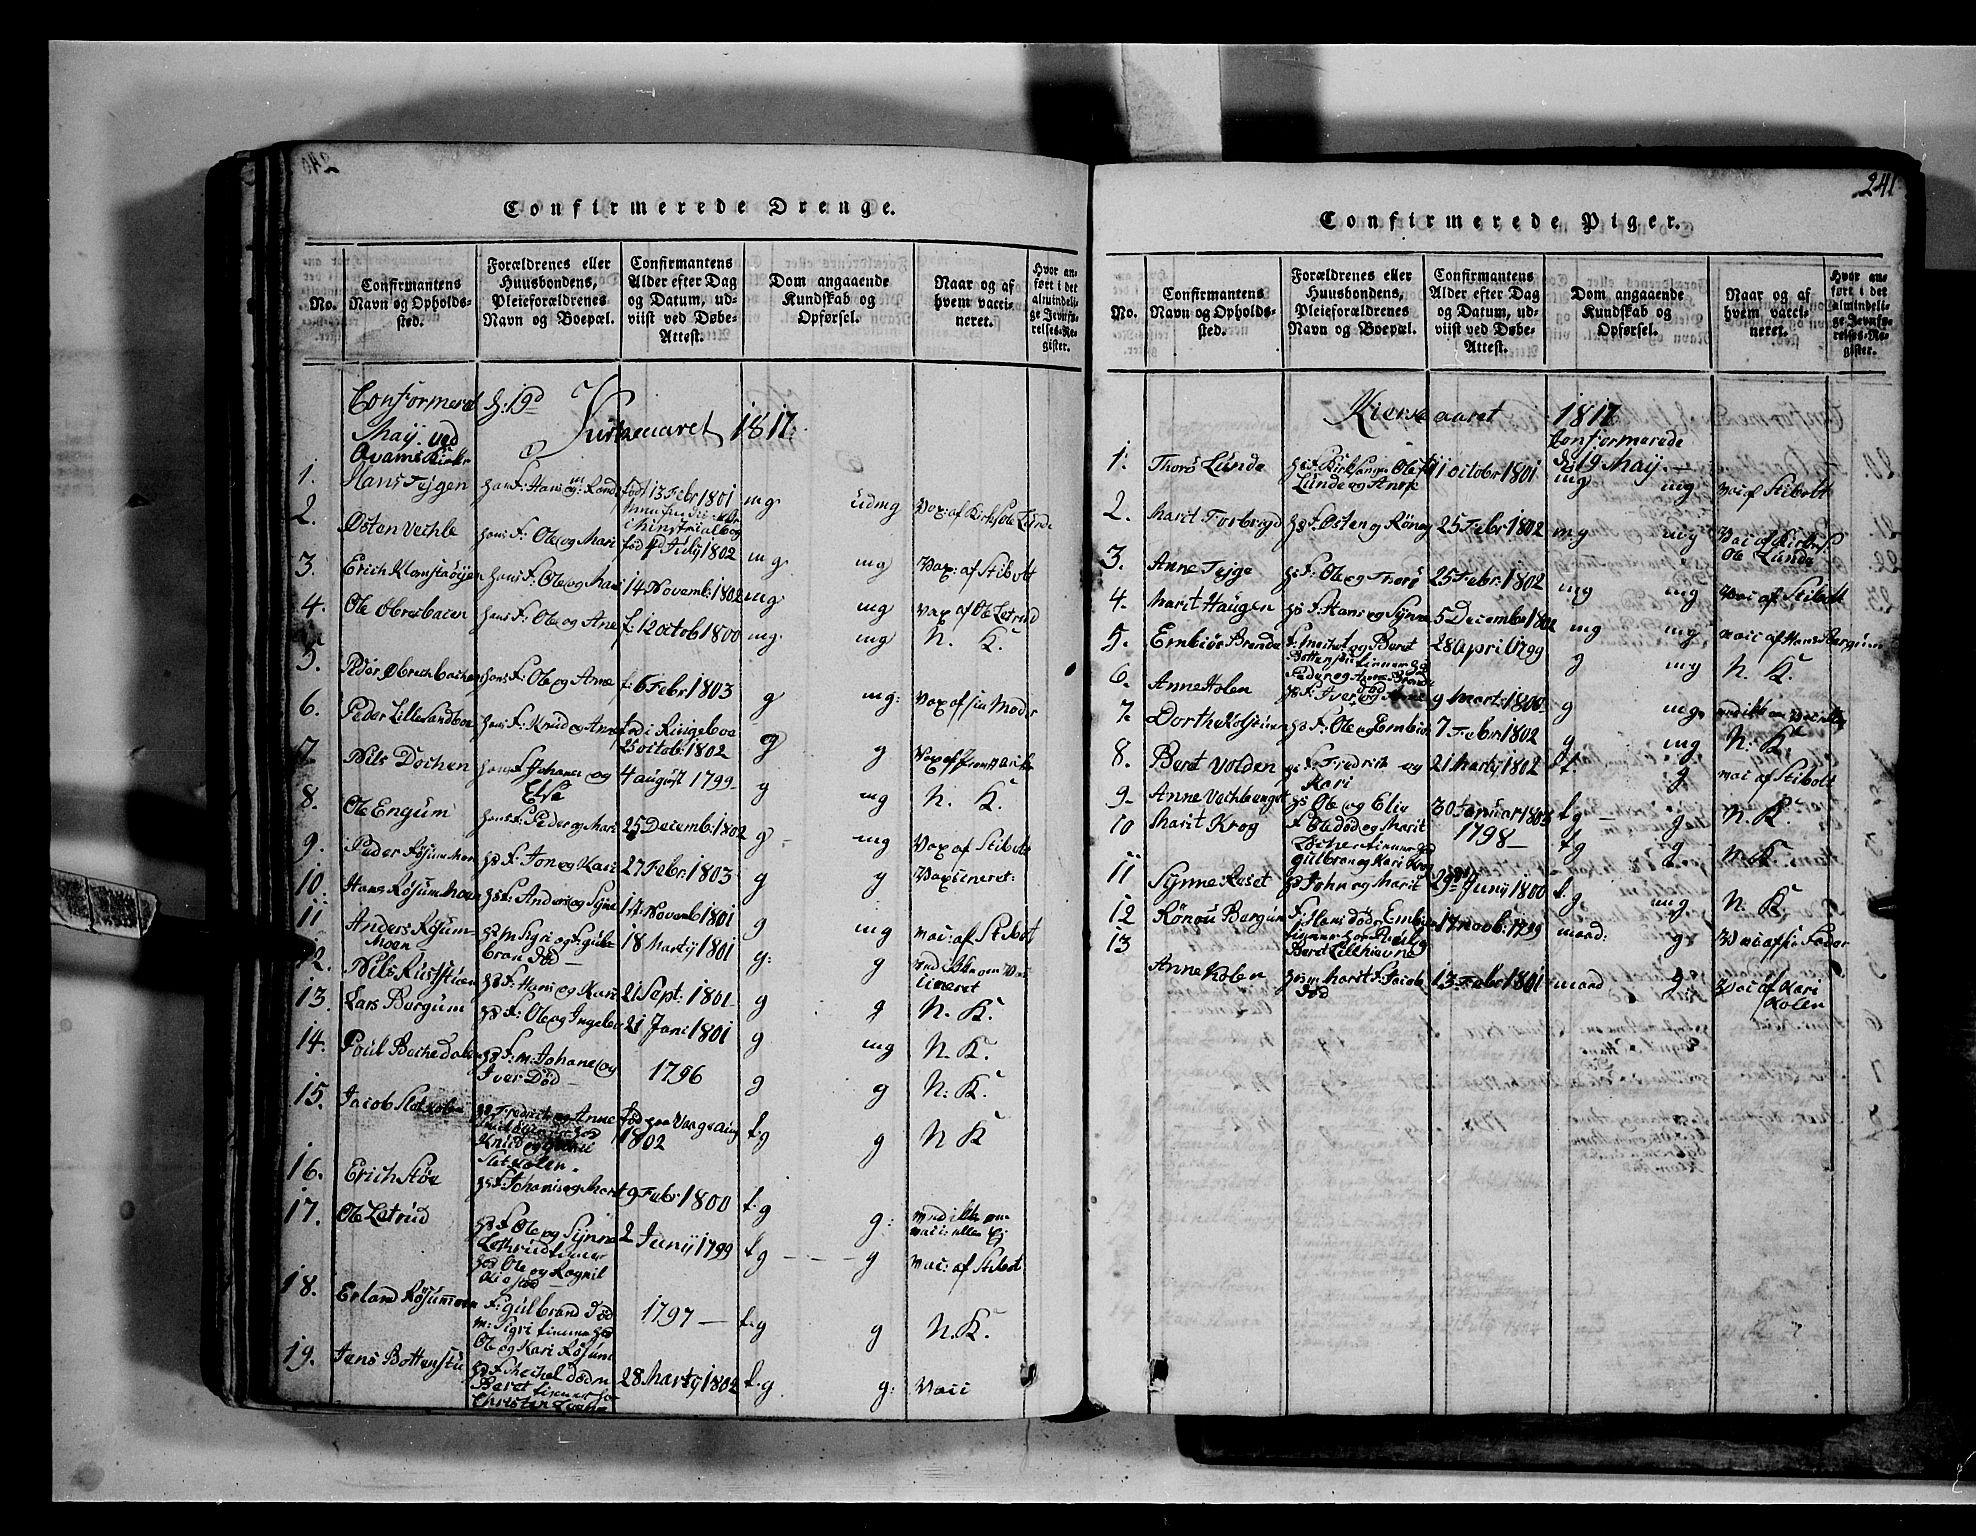 SAH, Fron prestekontor, H/Ha/Hab/L0002: Klokkerbok nr. 2, 1816-1850, s. 241